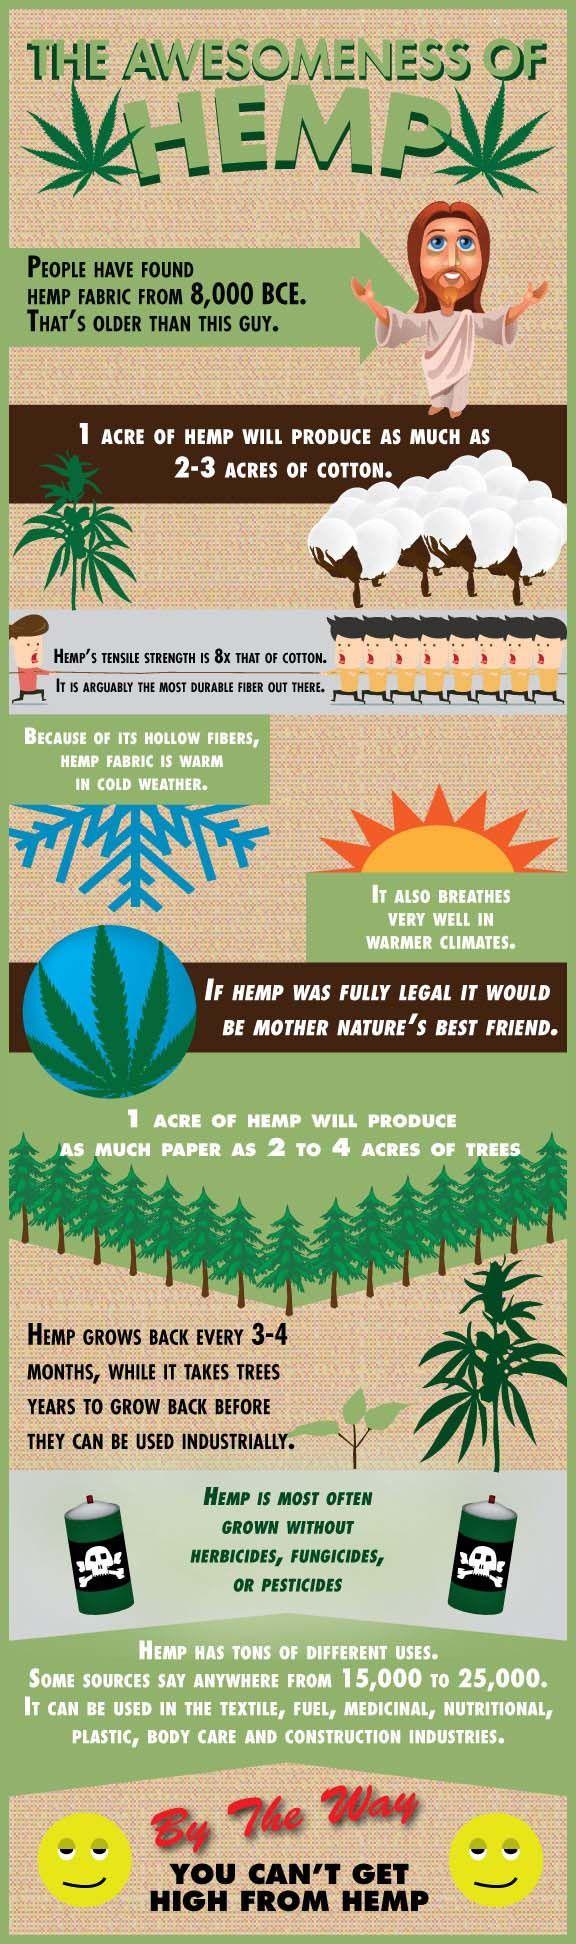 The Benefits Of Hemp Clothing